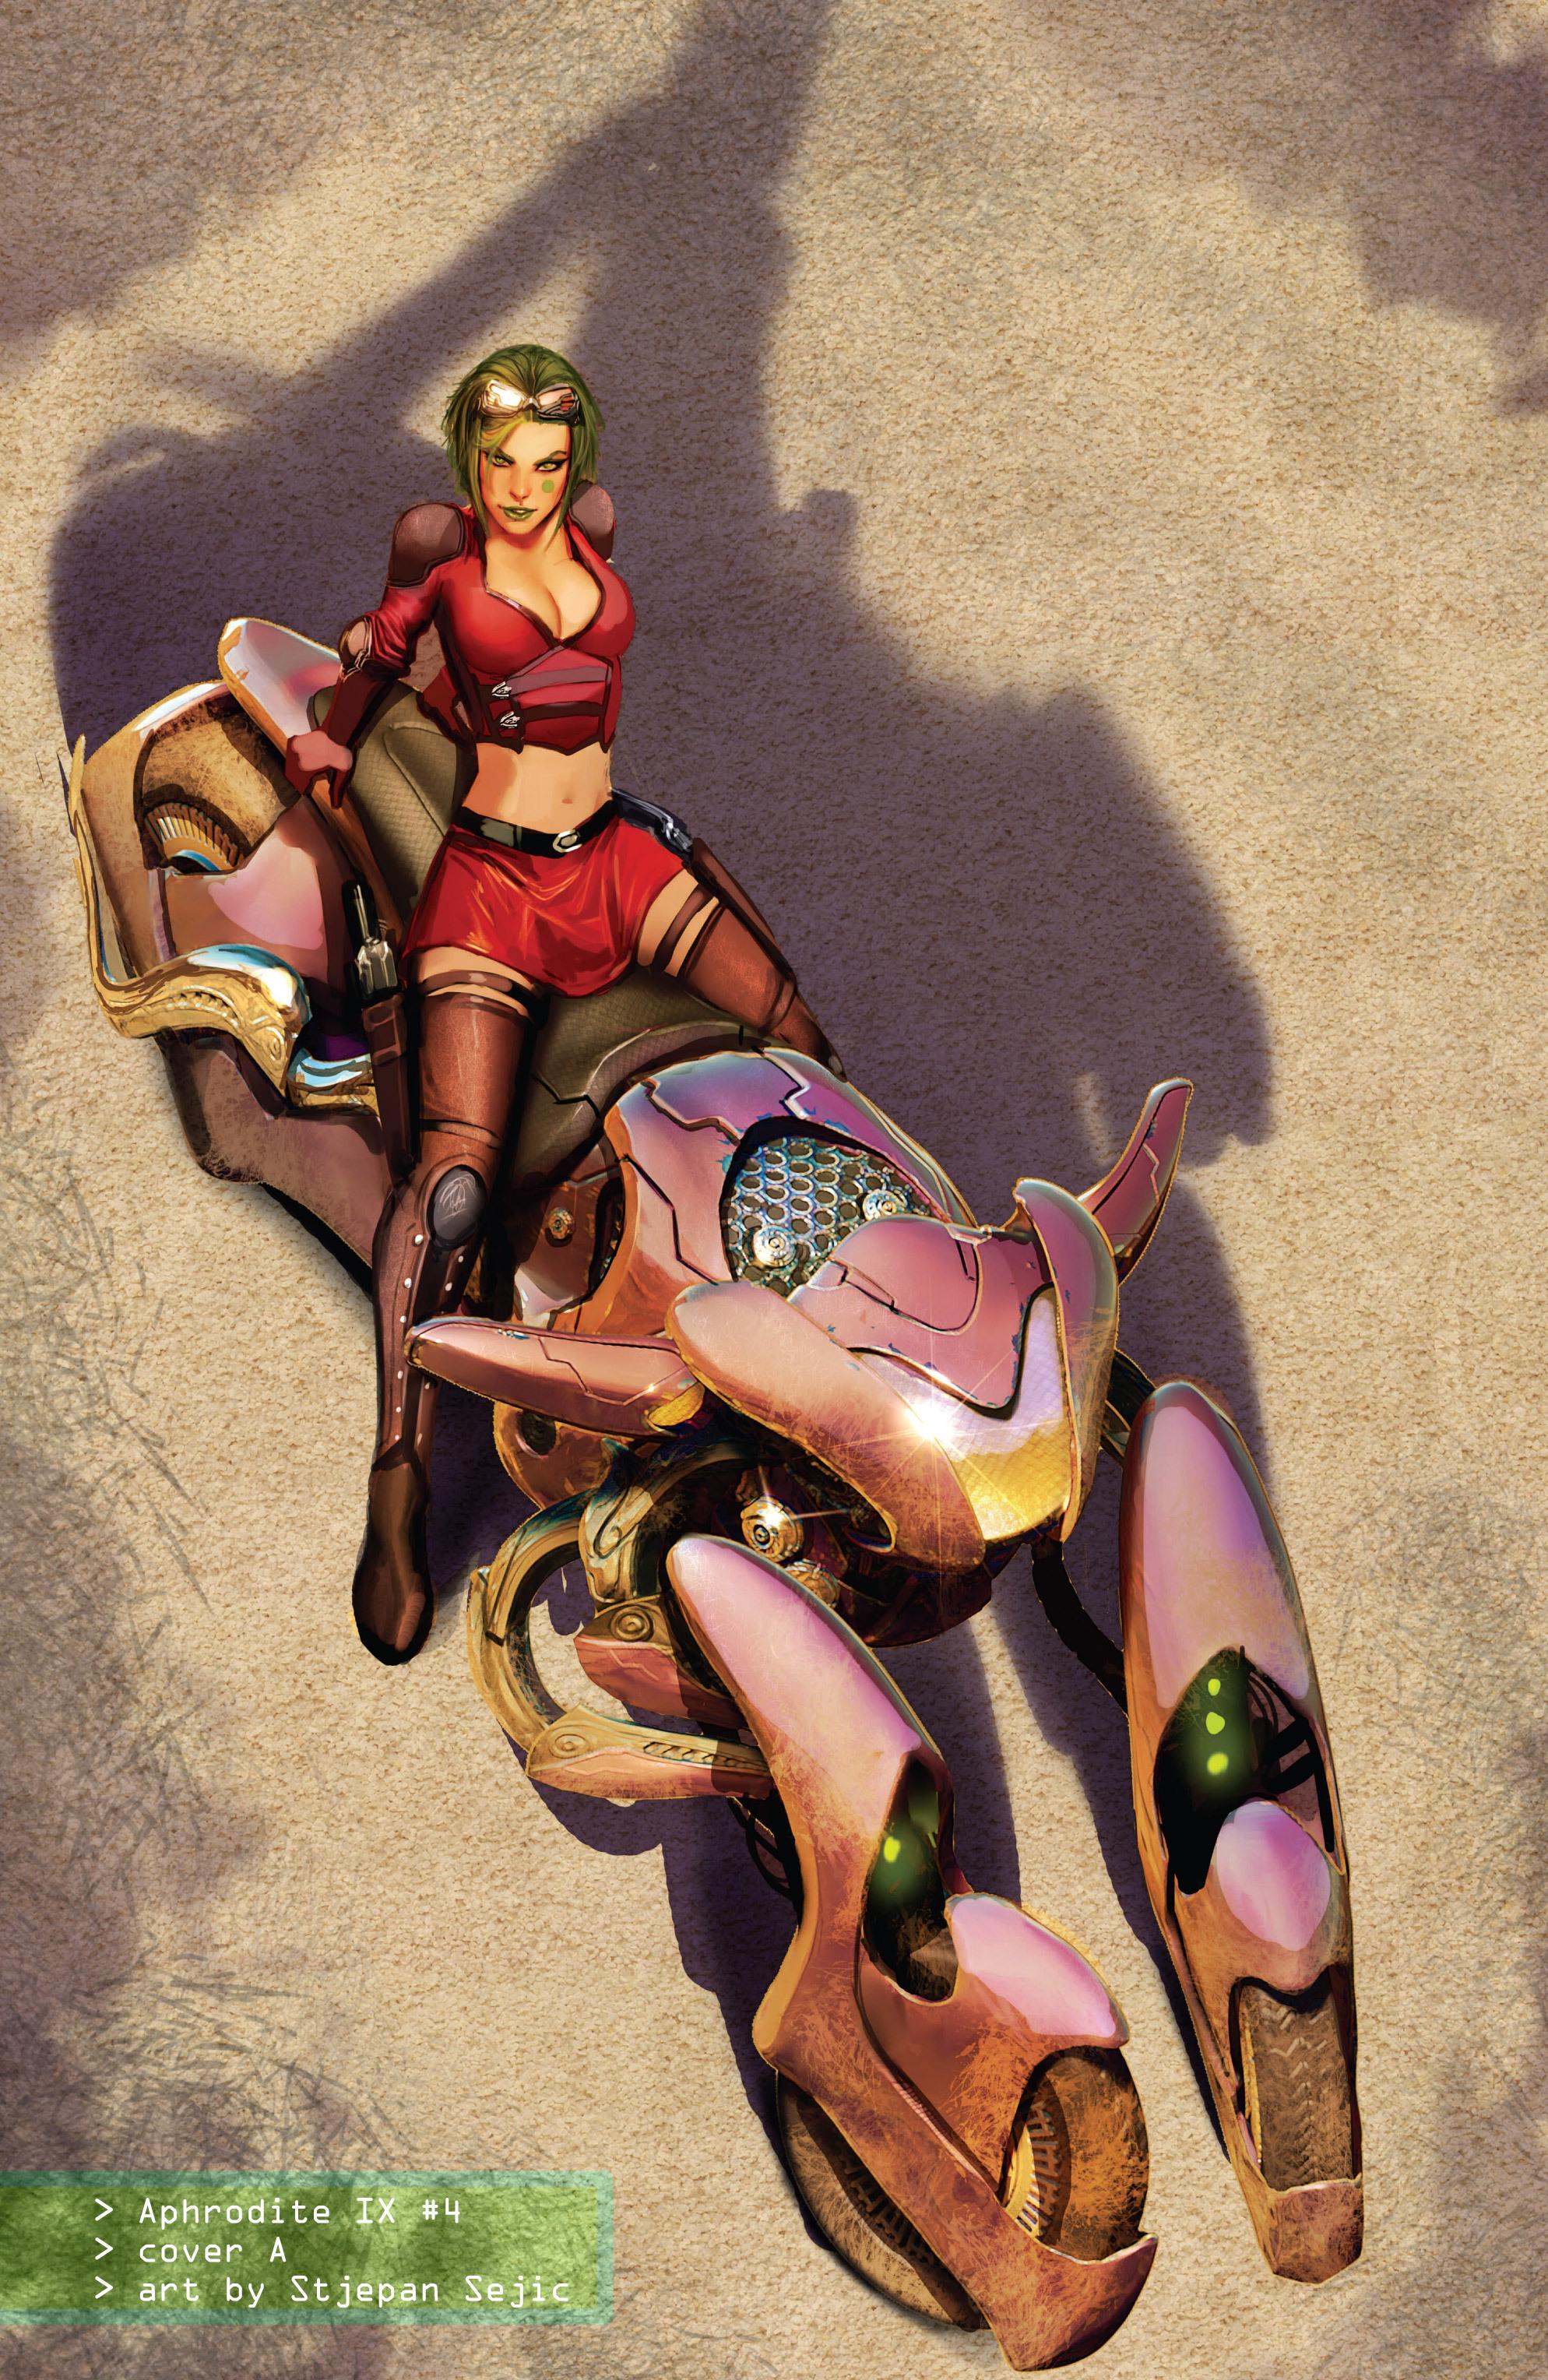 Read online Aphrodite IX (2013) comic -  Issue #Aphrodite IX (2013) _TPB 1 - 116